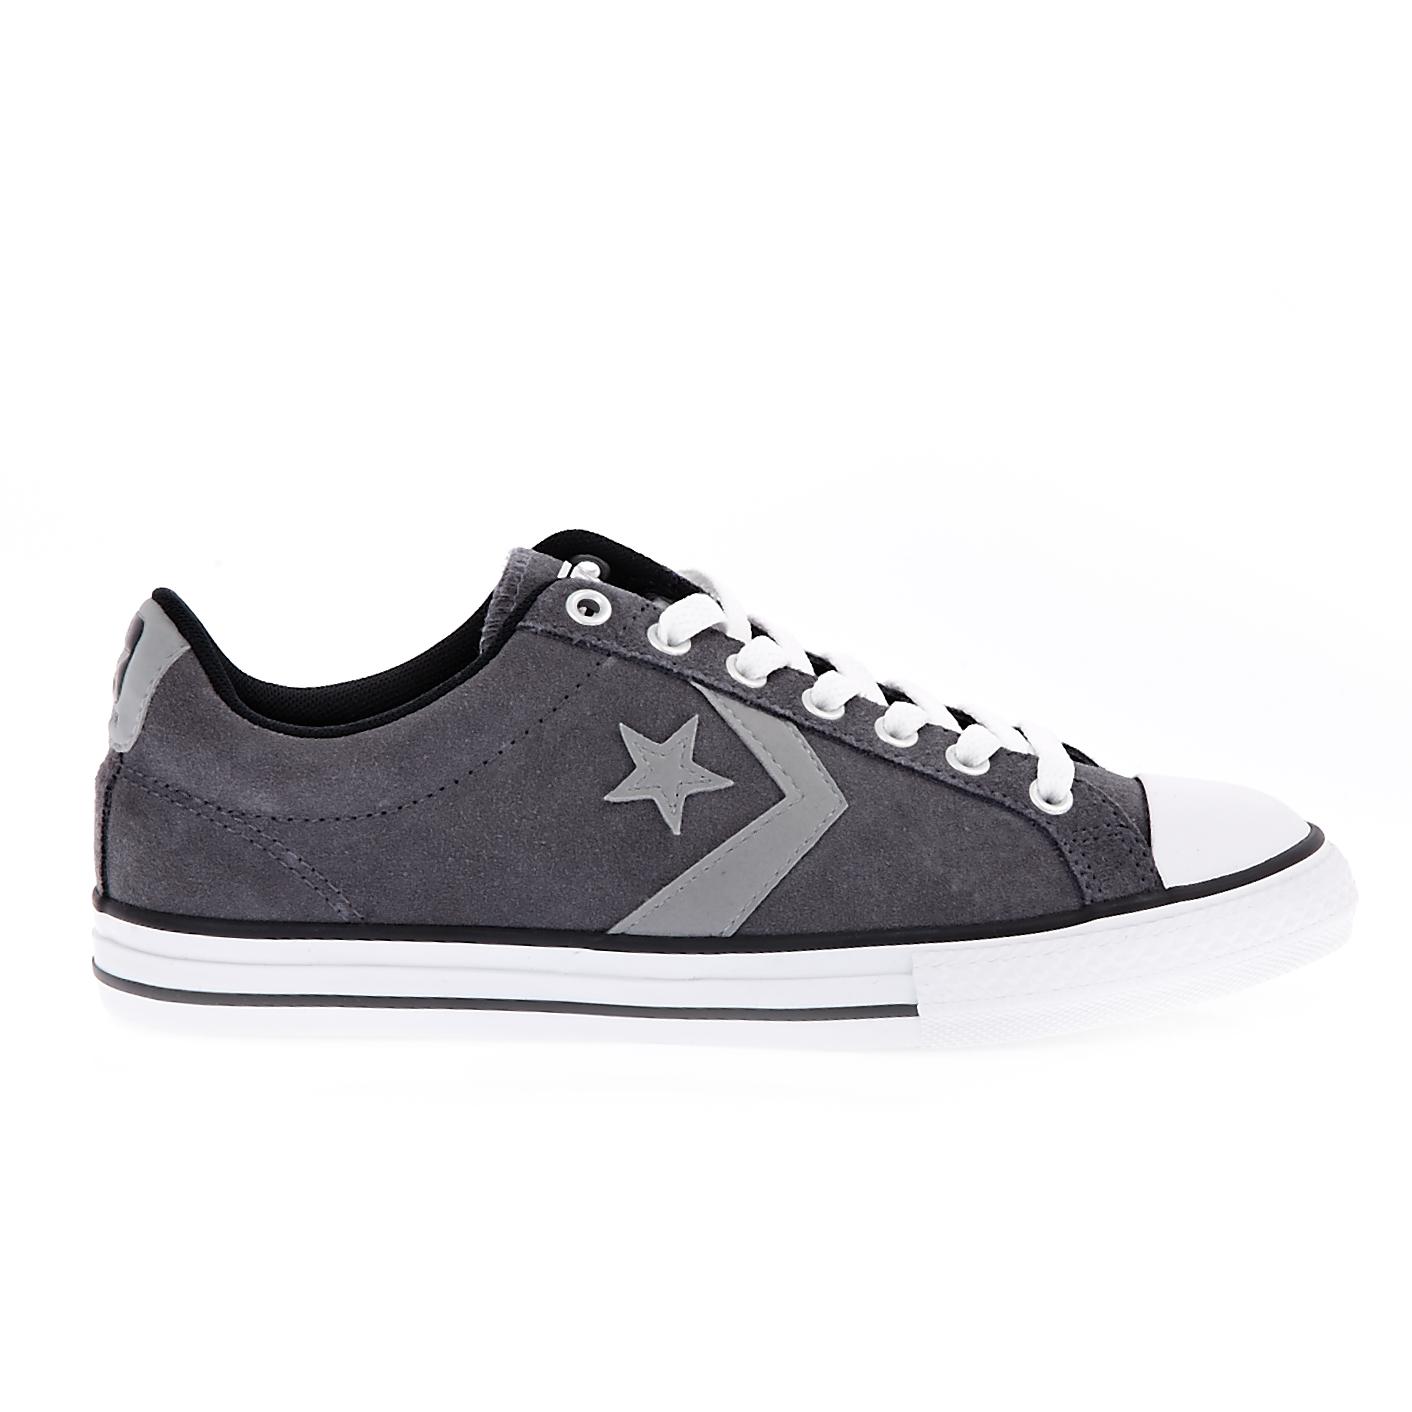 CONVERSE – Παιδικά παπούτσια Star Player Ev OX γκρι